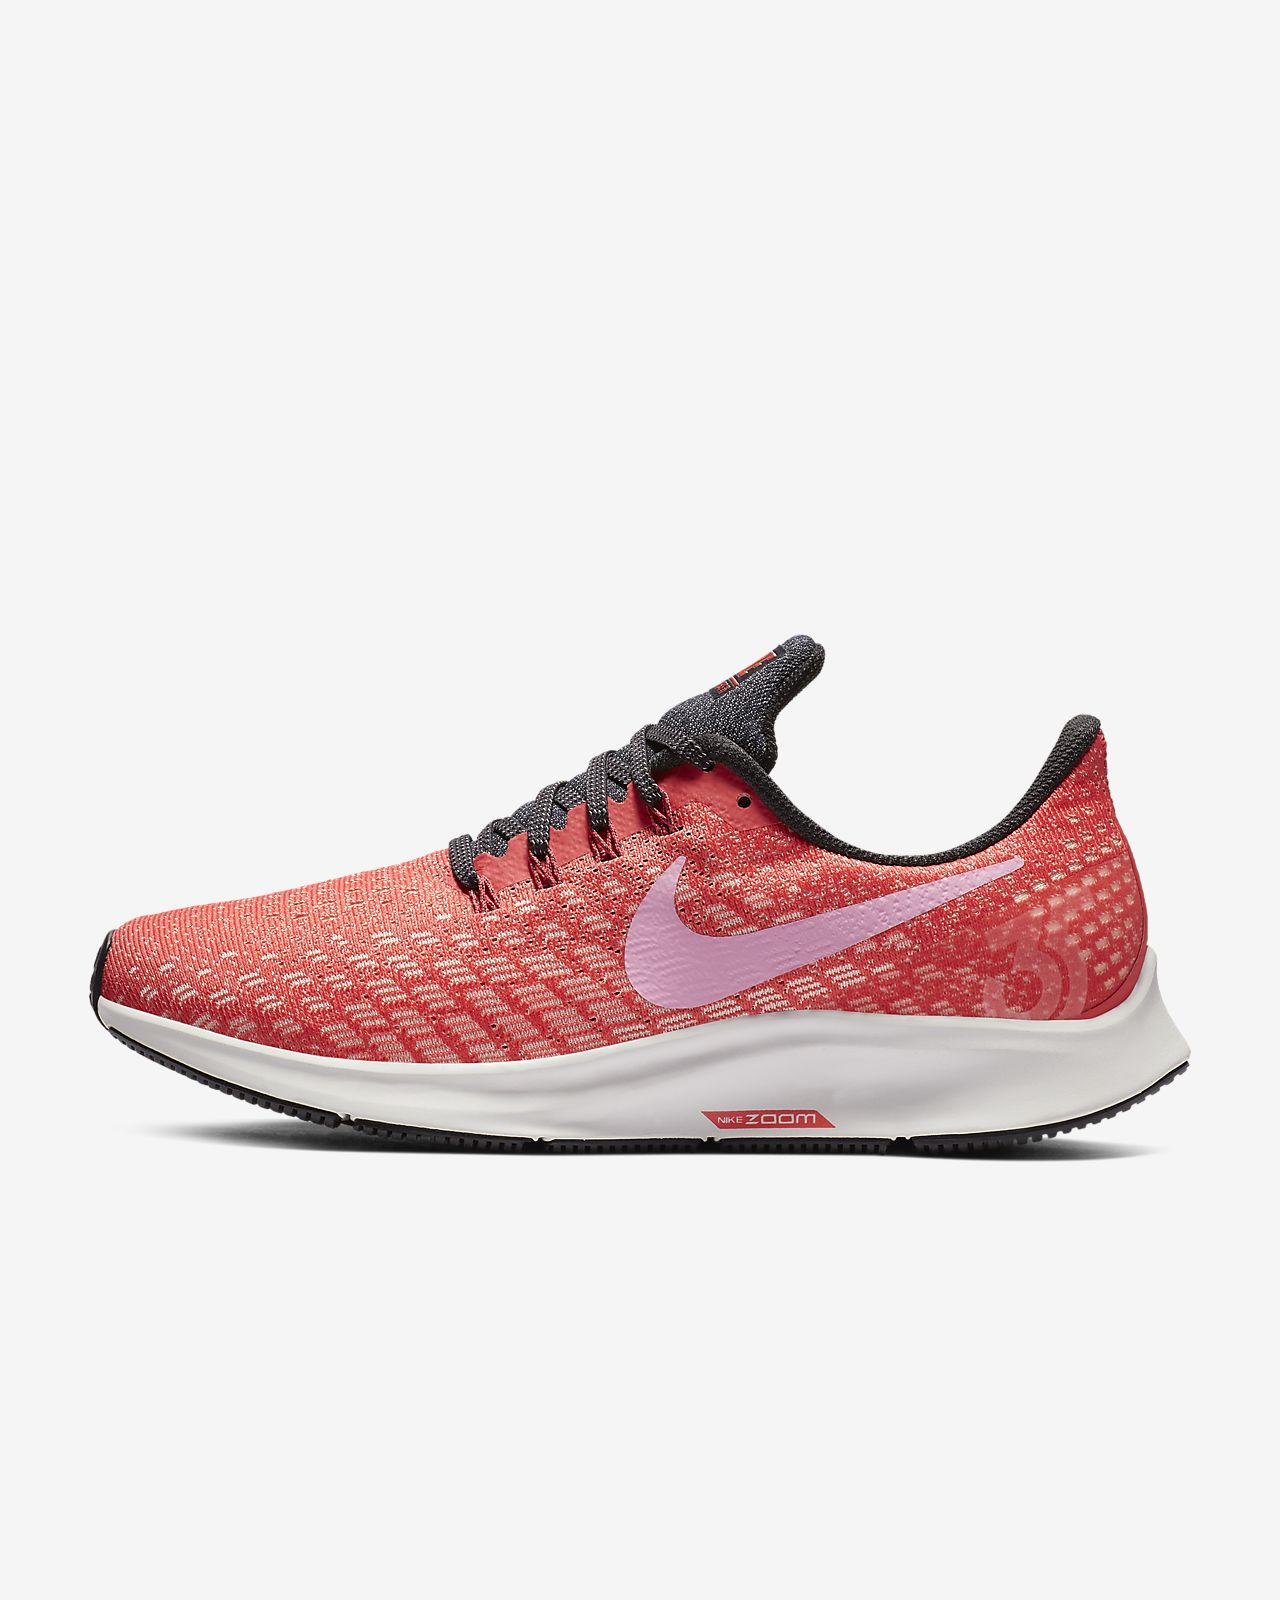 cbe84a77e2d086 Imágenes de Nike Air Zoom Pegasus Womens Running Shoe